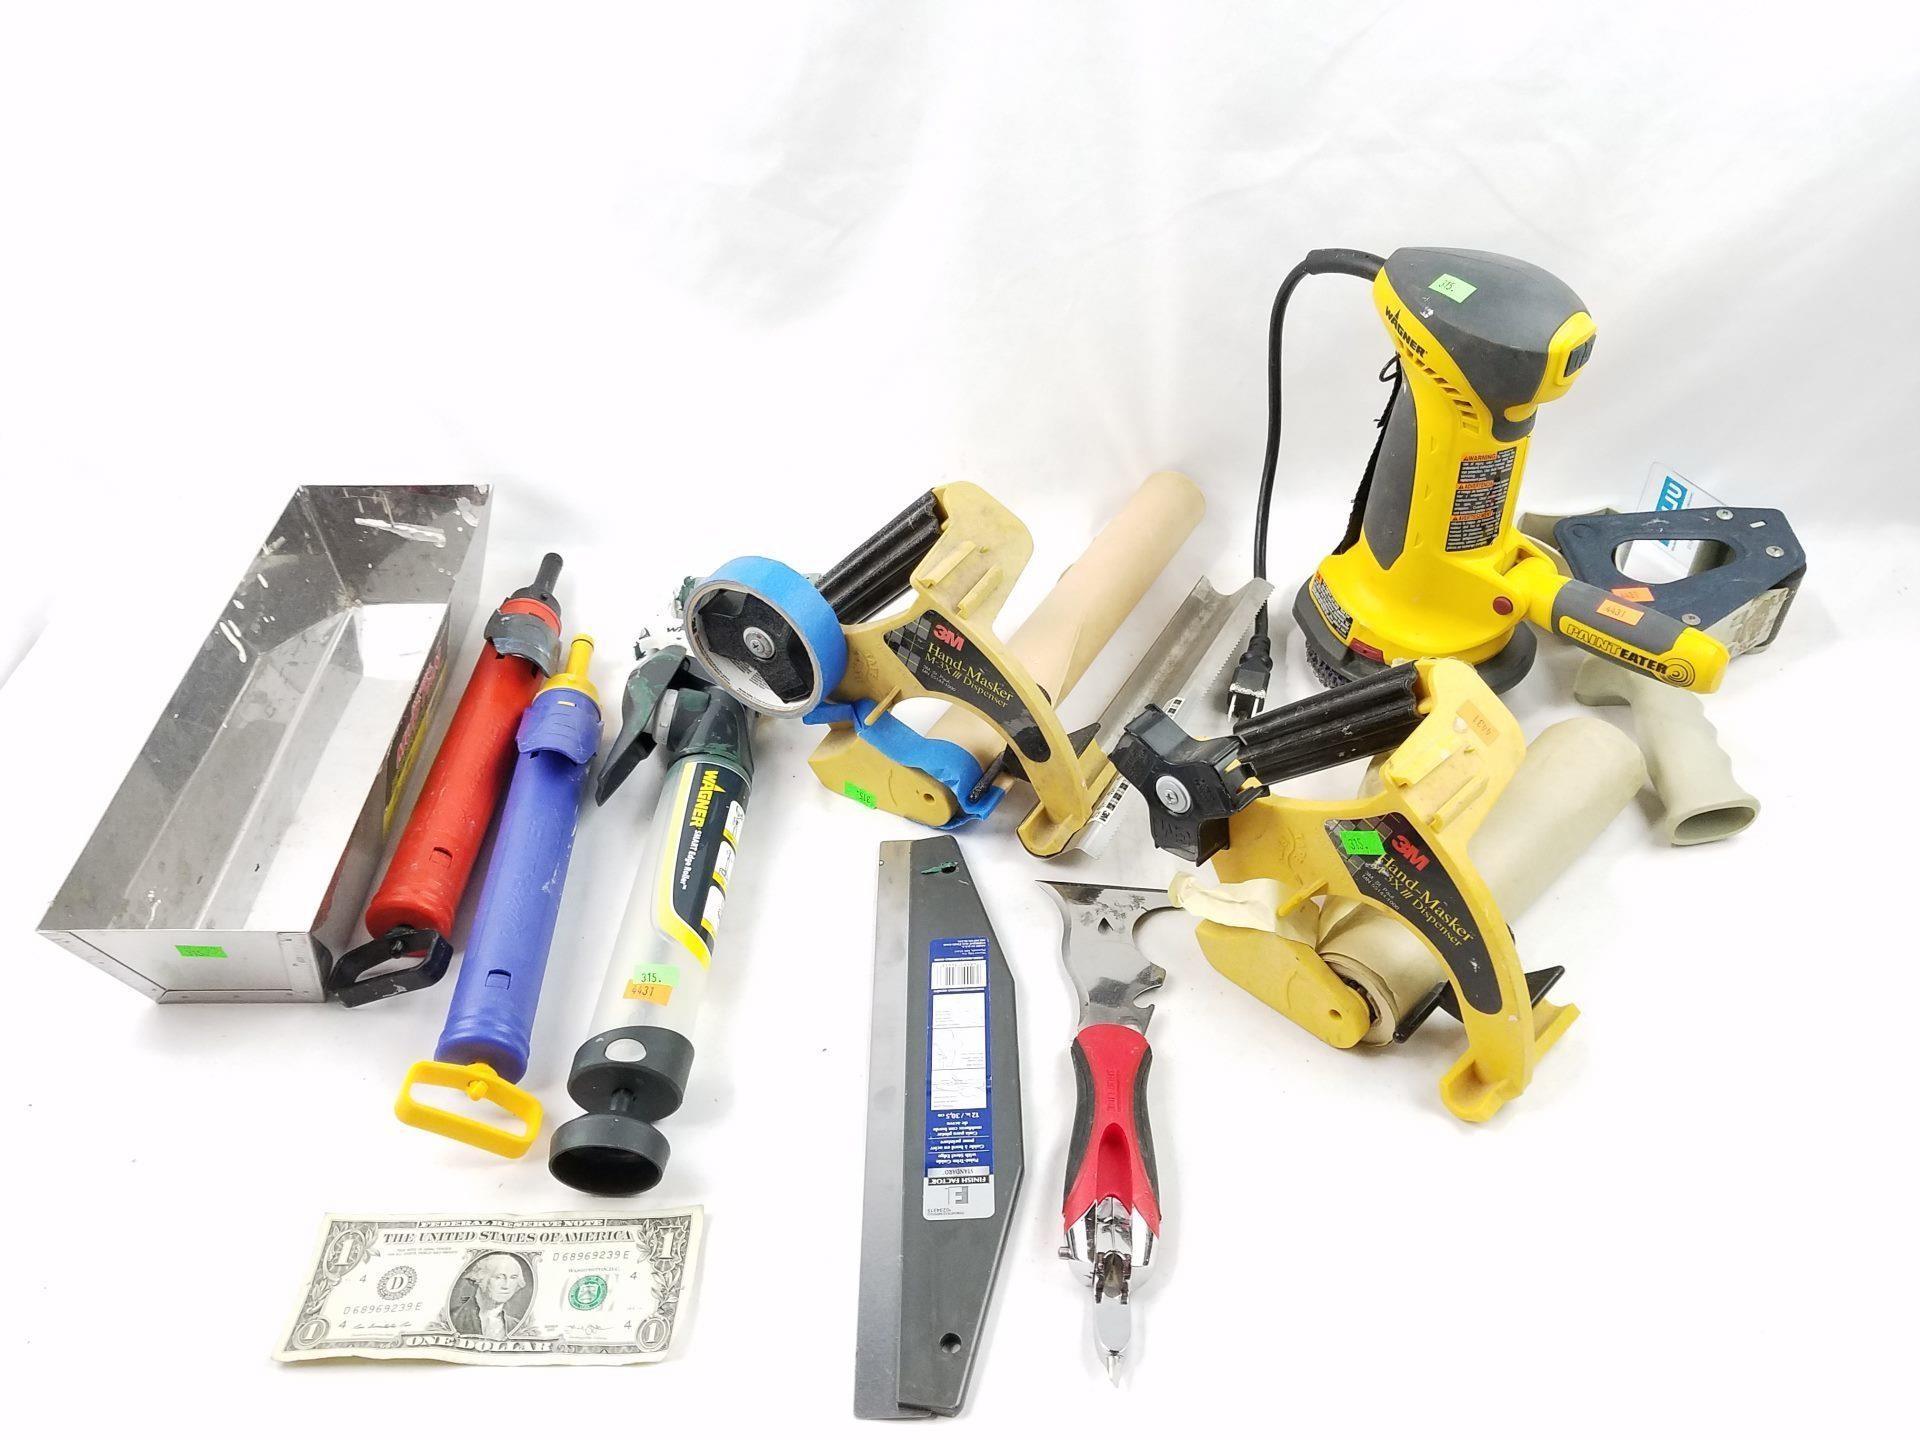 Painting & Drywall Supplies   HiBid Auctions   Washington